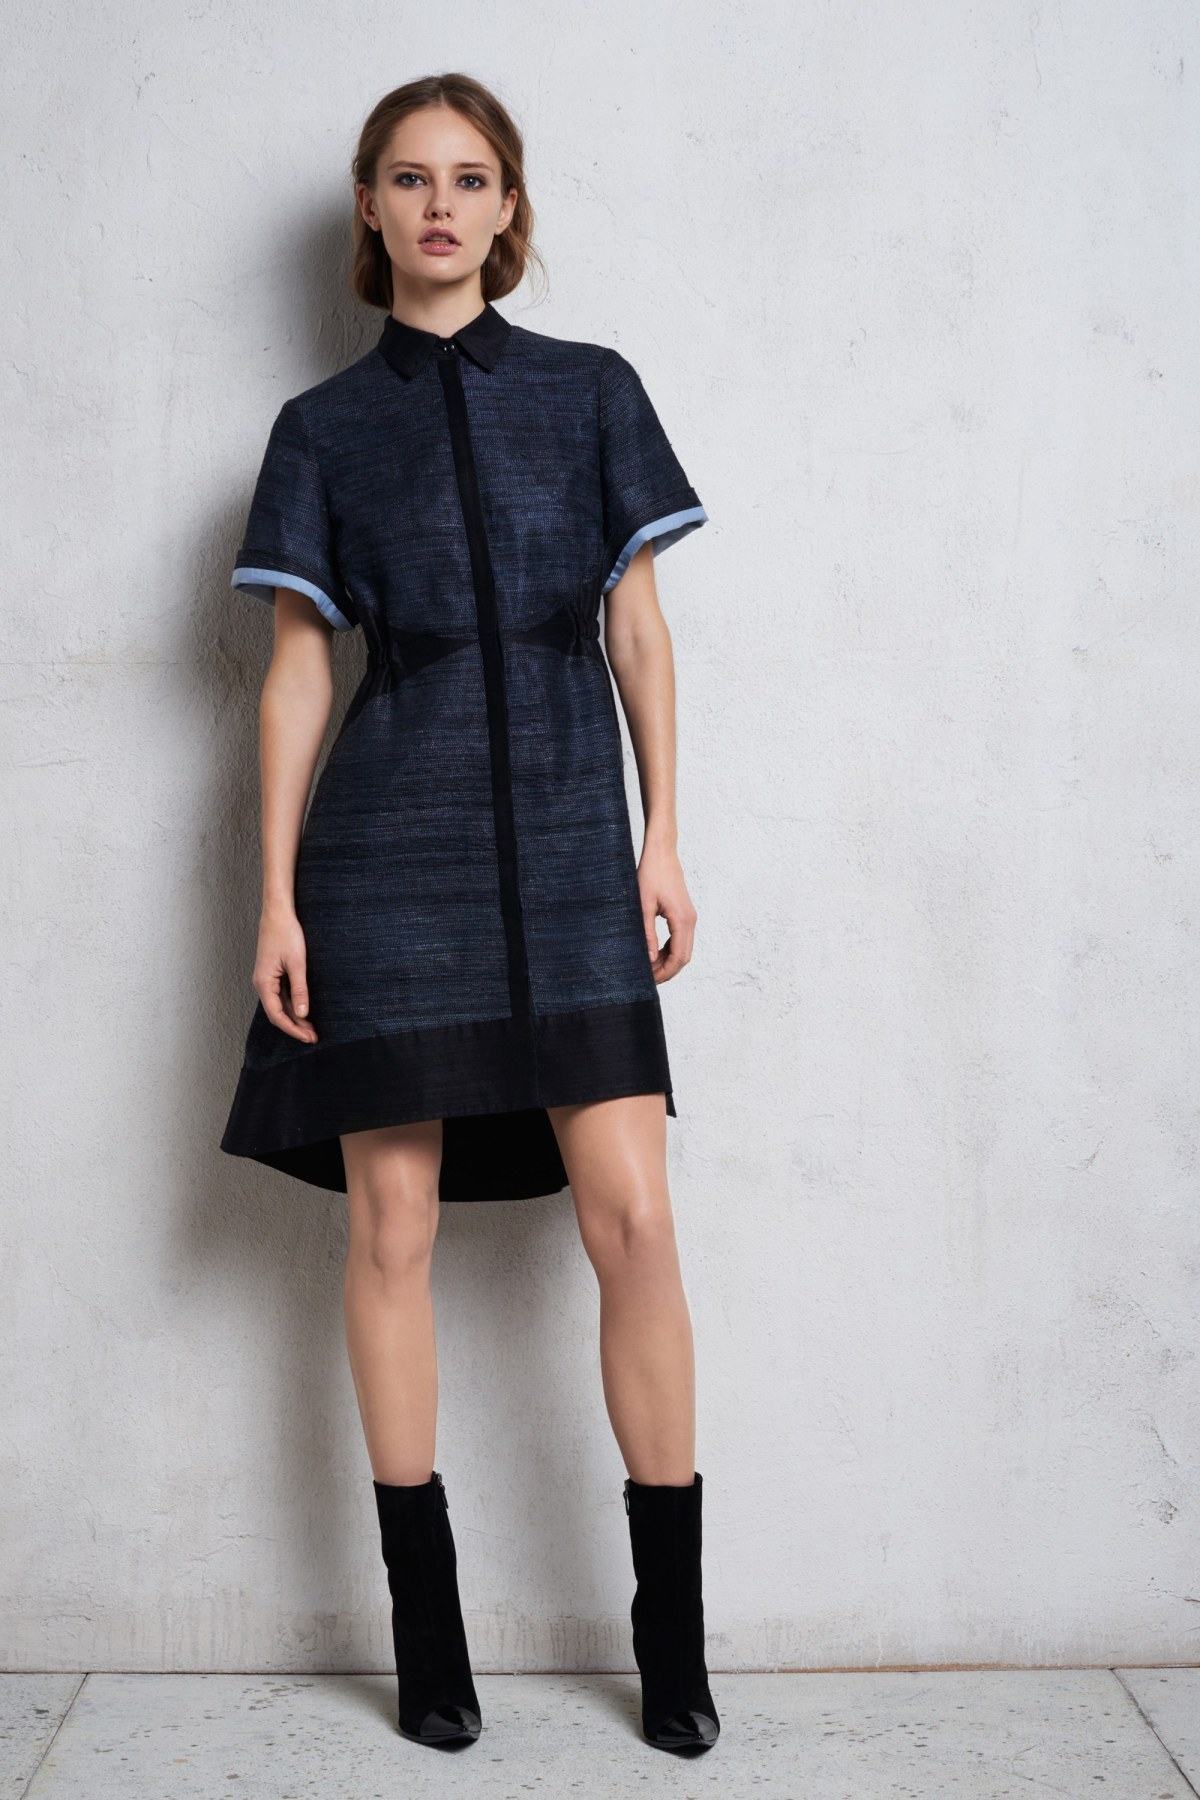 kimora-lee-simmons-pre-fall-2017-fashion-show-the-impression-02